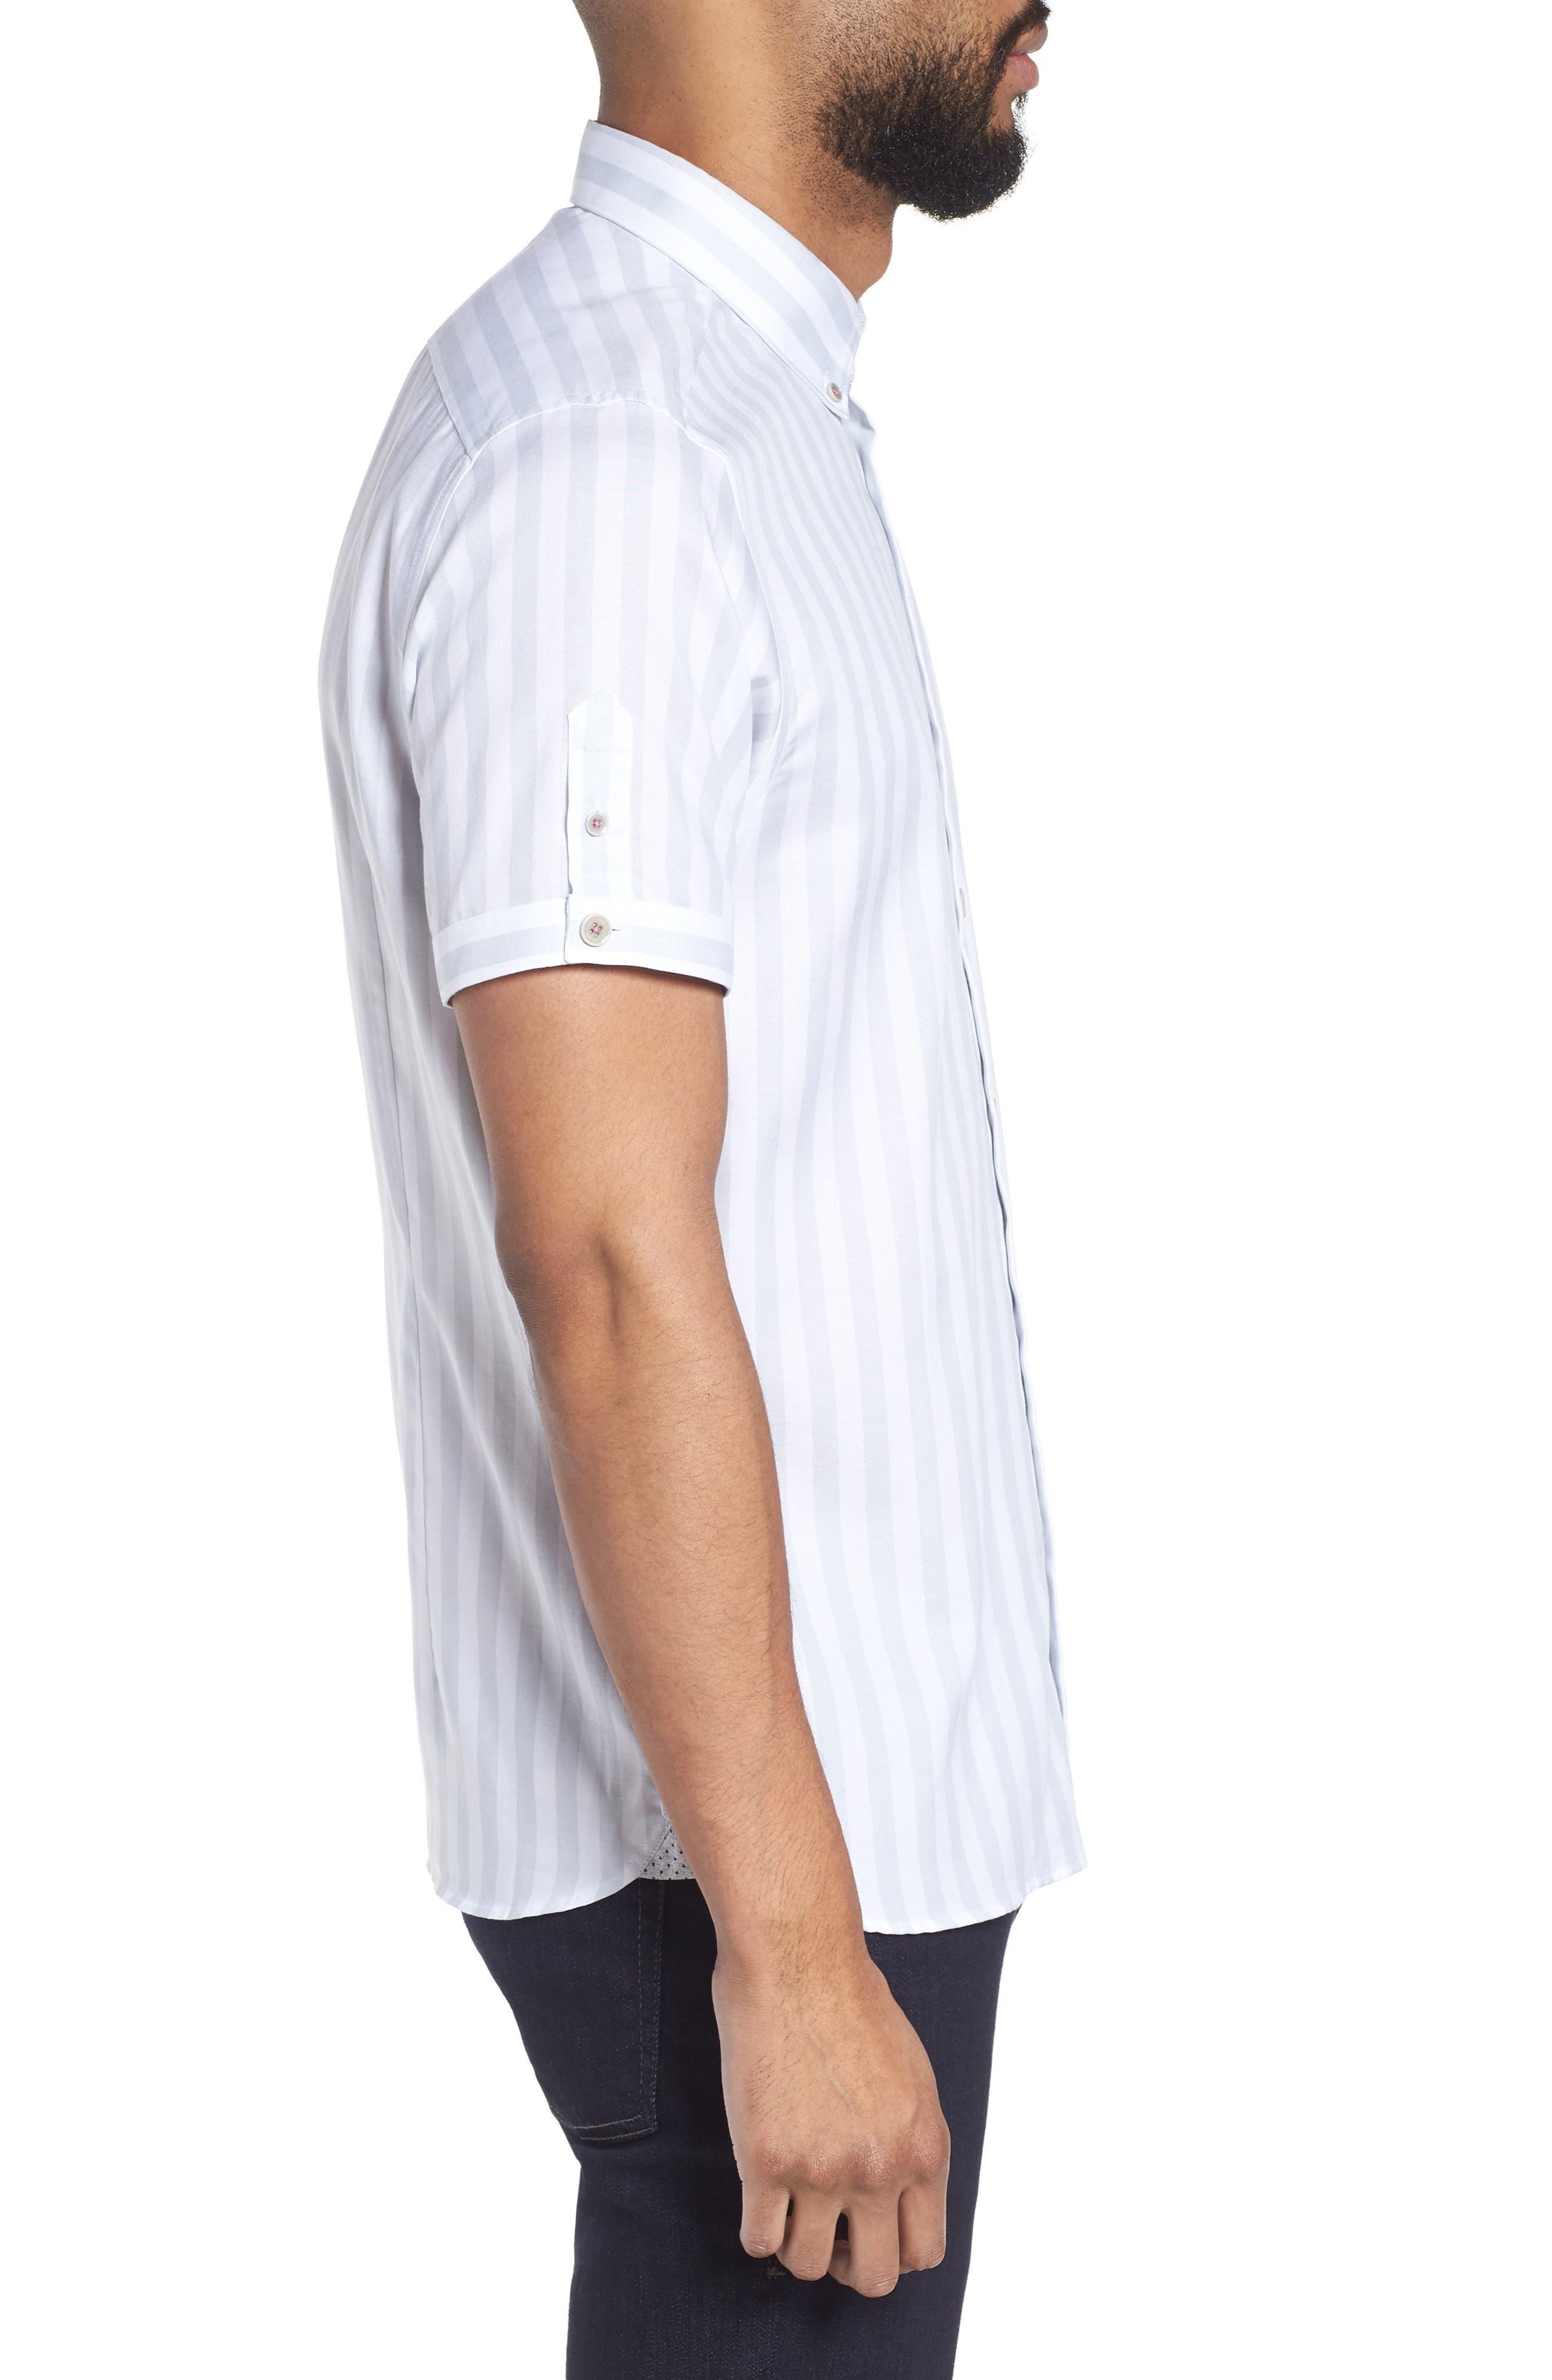 TED BAKER LONDON,                             Vertical Stripe Trim Fit Short Sleeve Sport Shirt,                             Alternate thumbnail 3, color,                             311